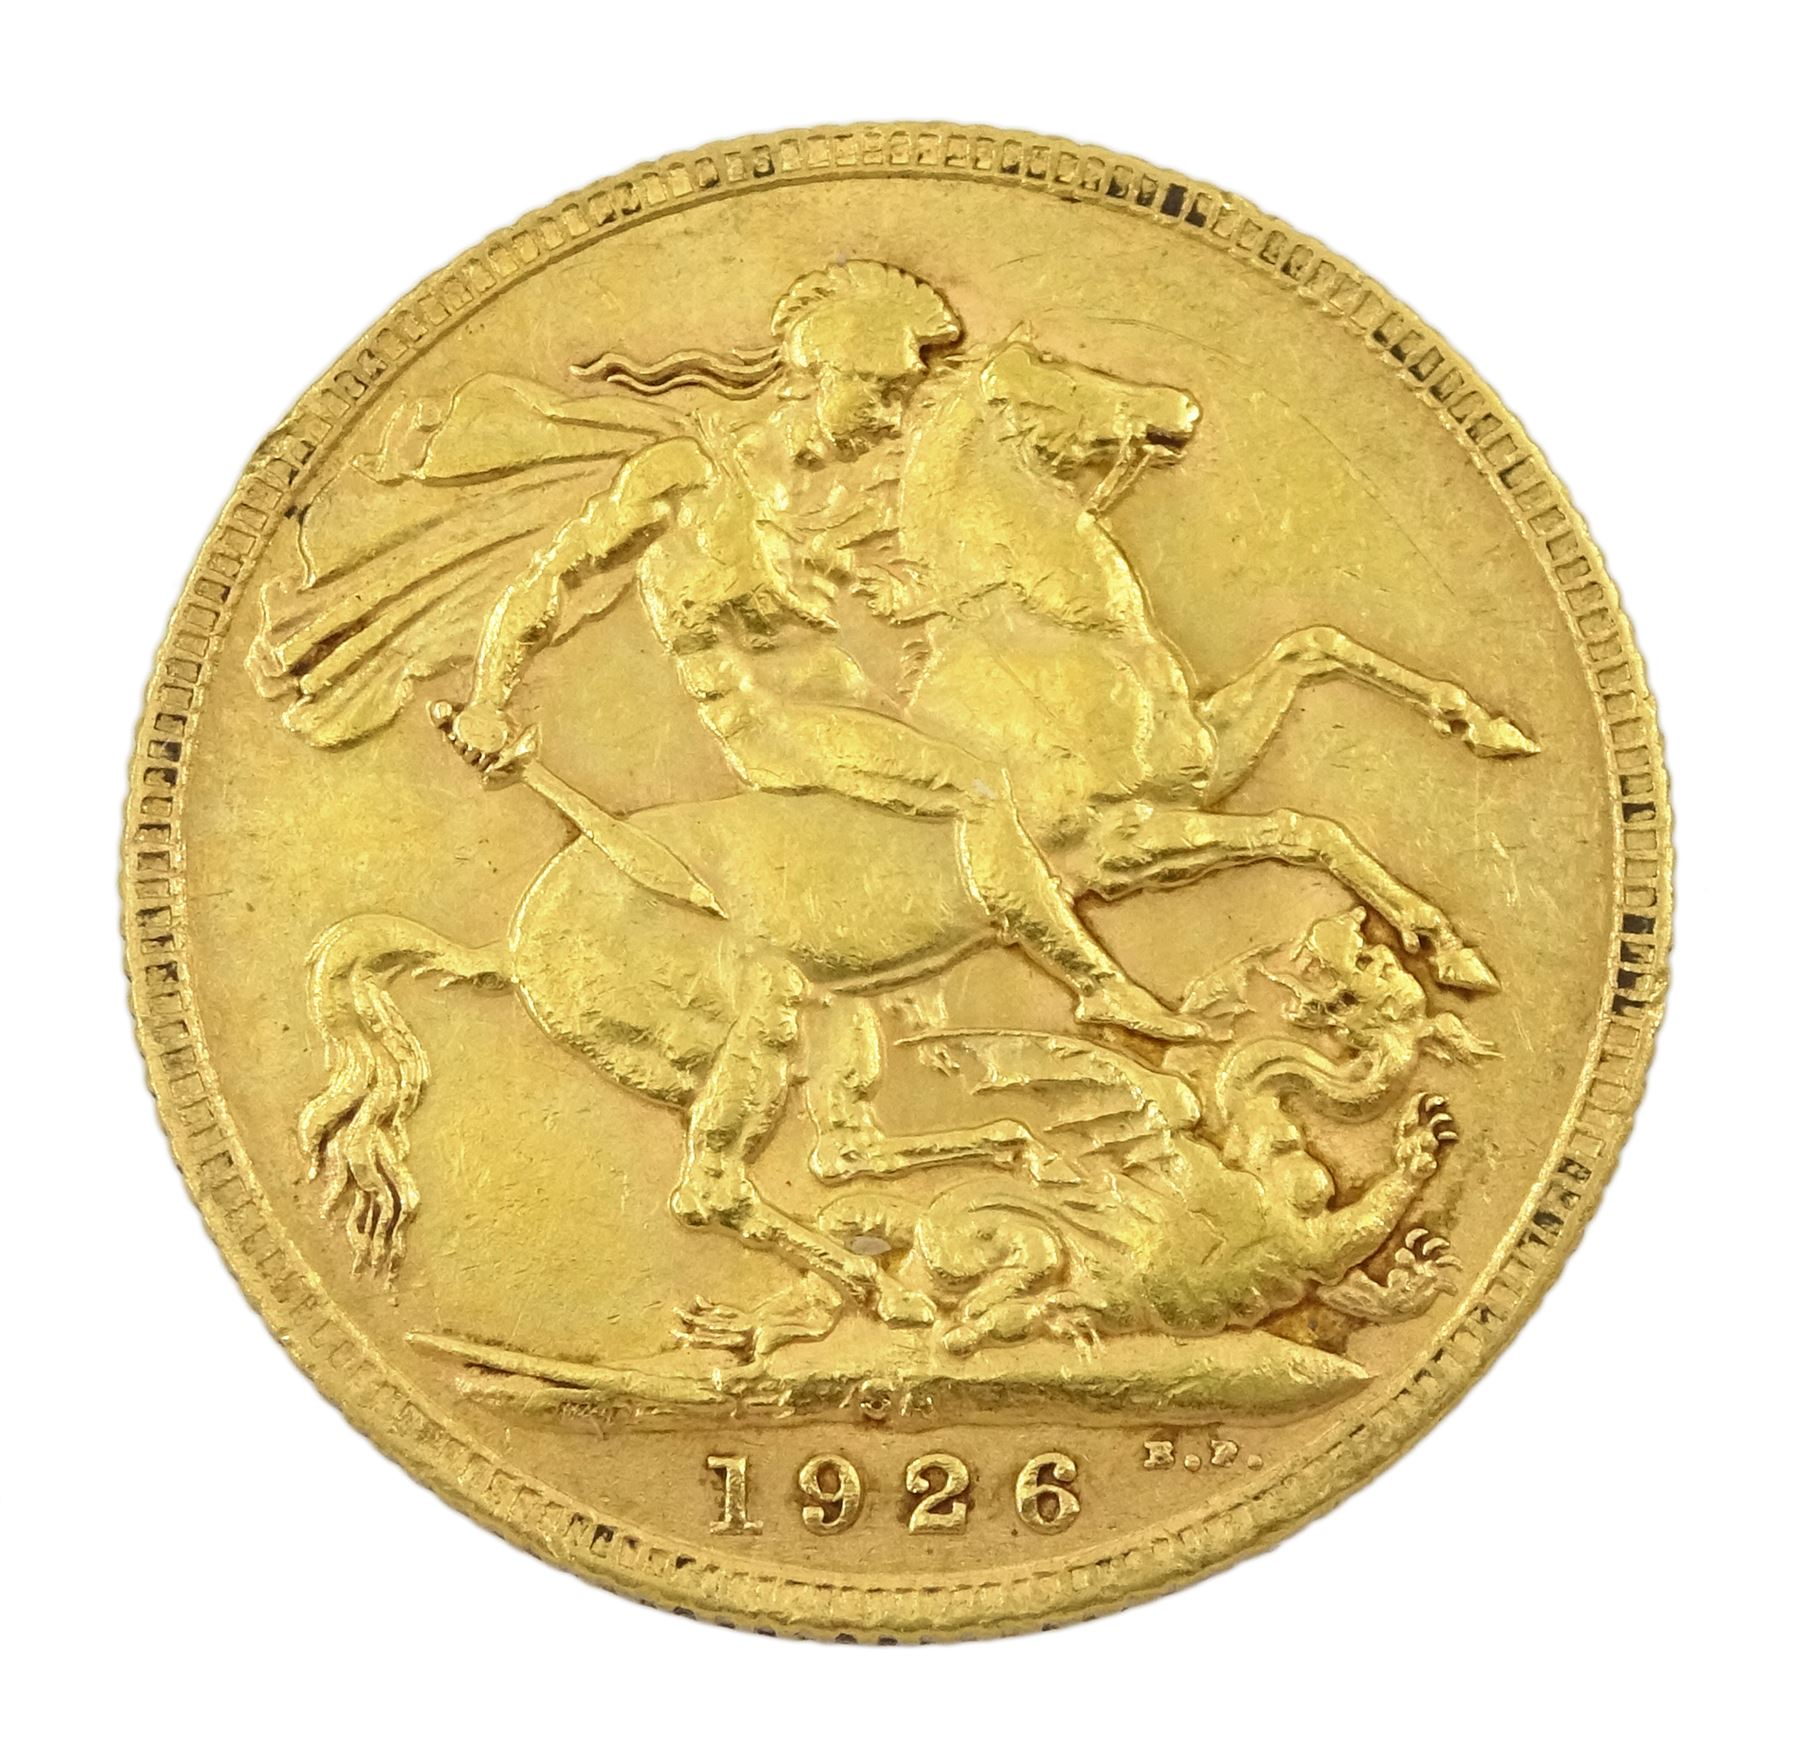 King George V 1926 gold full sovereign coin - Image 2 of 2